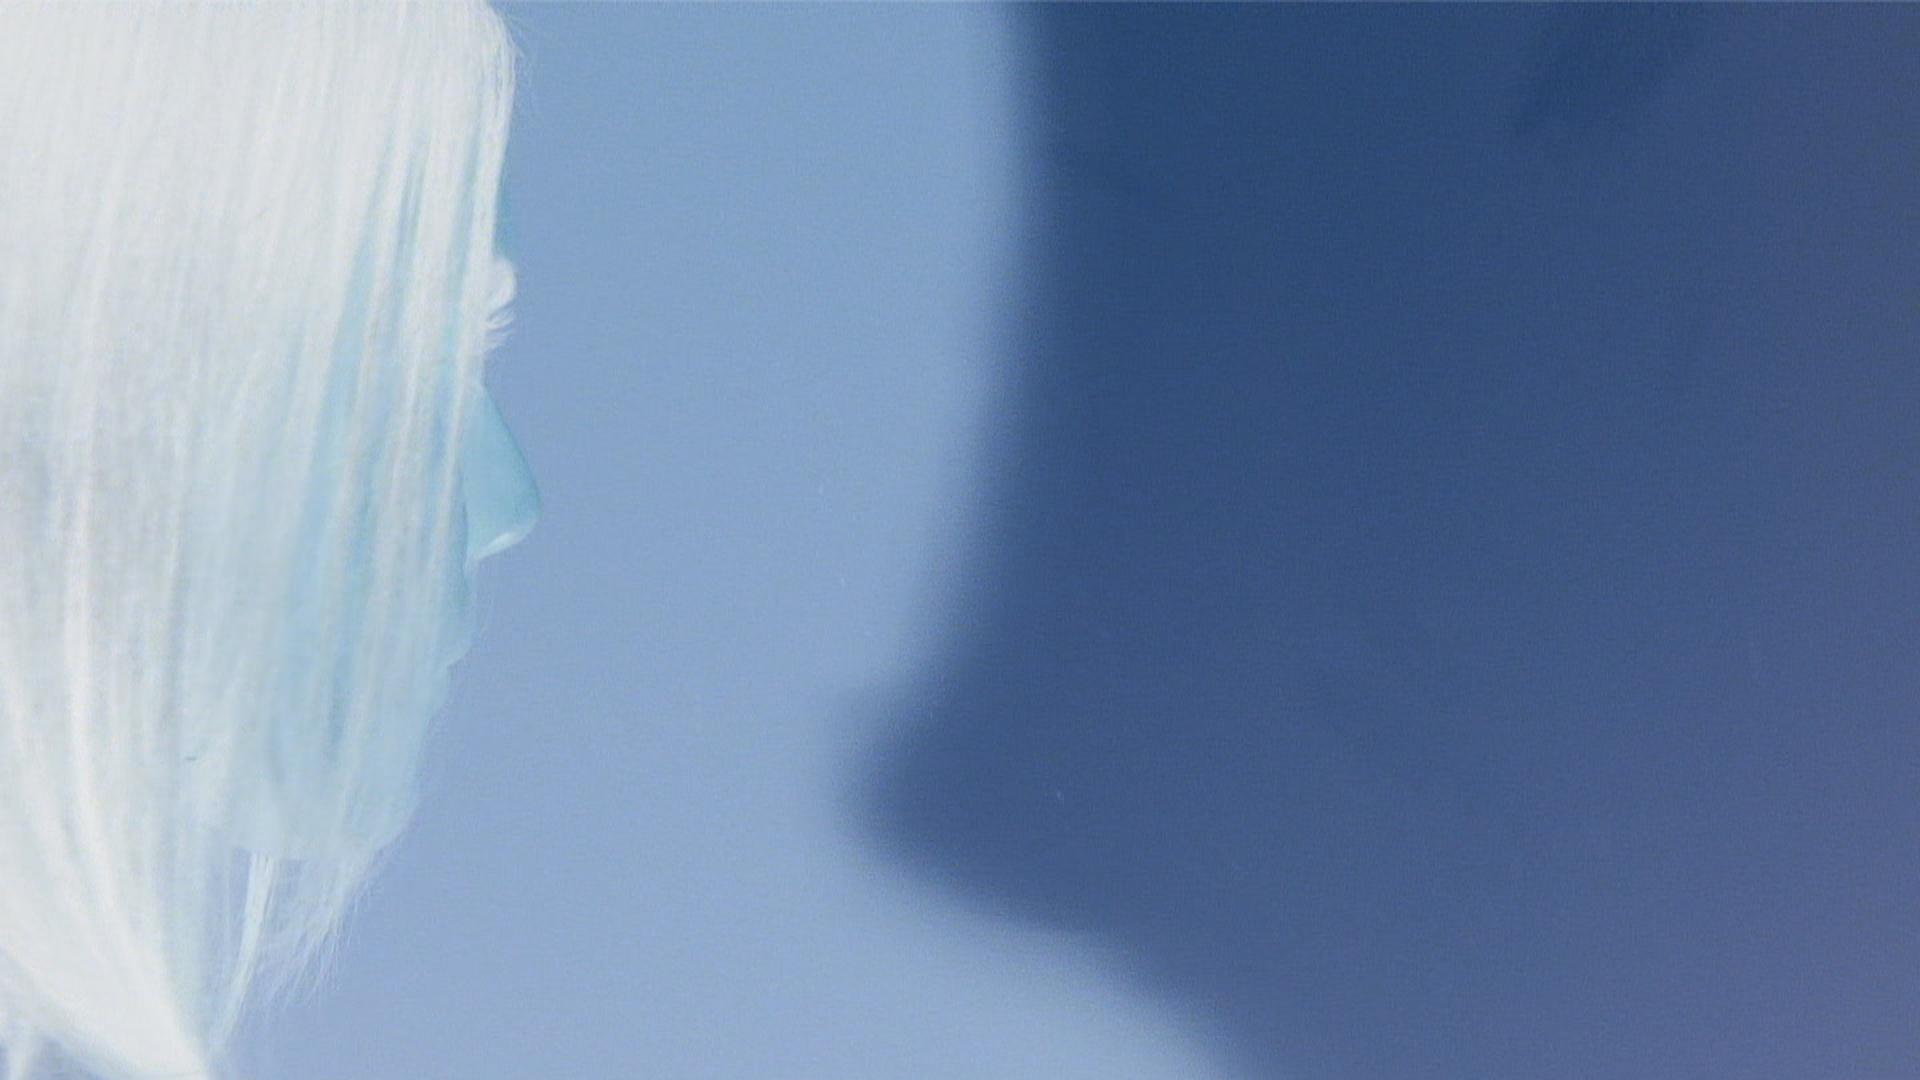 Rohan Quine, 'The Imagination Thief' - film 'JAYMI 115', still 46